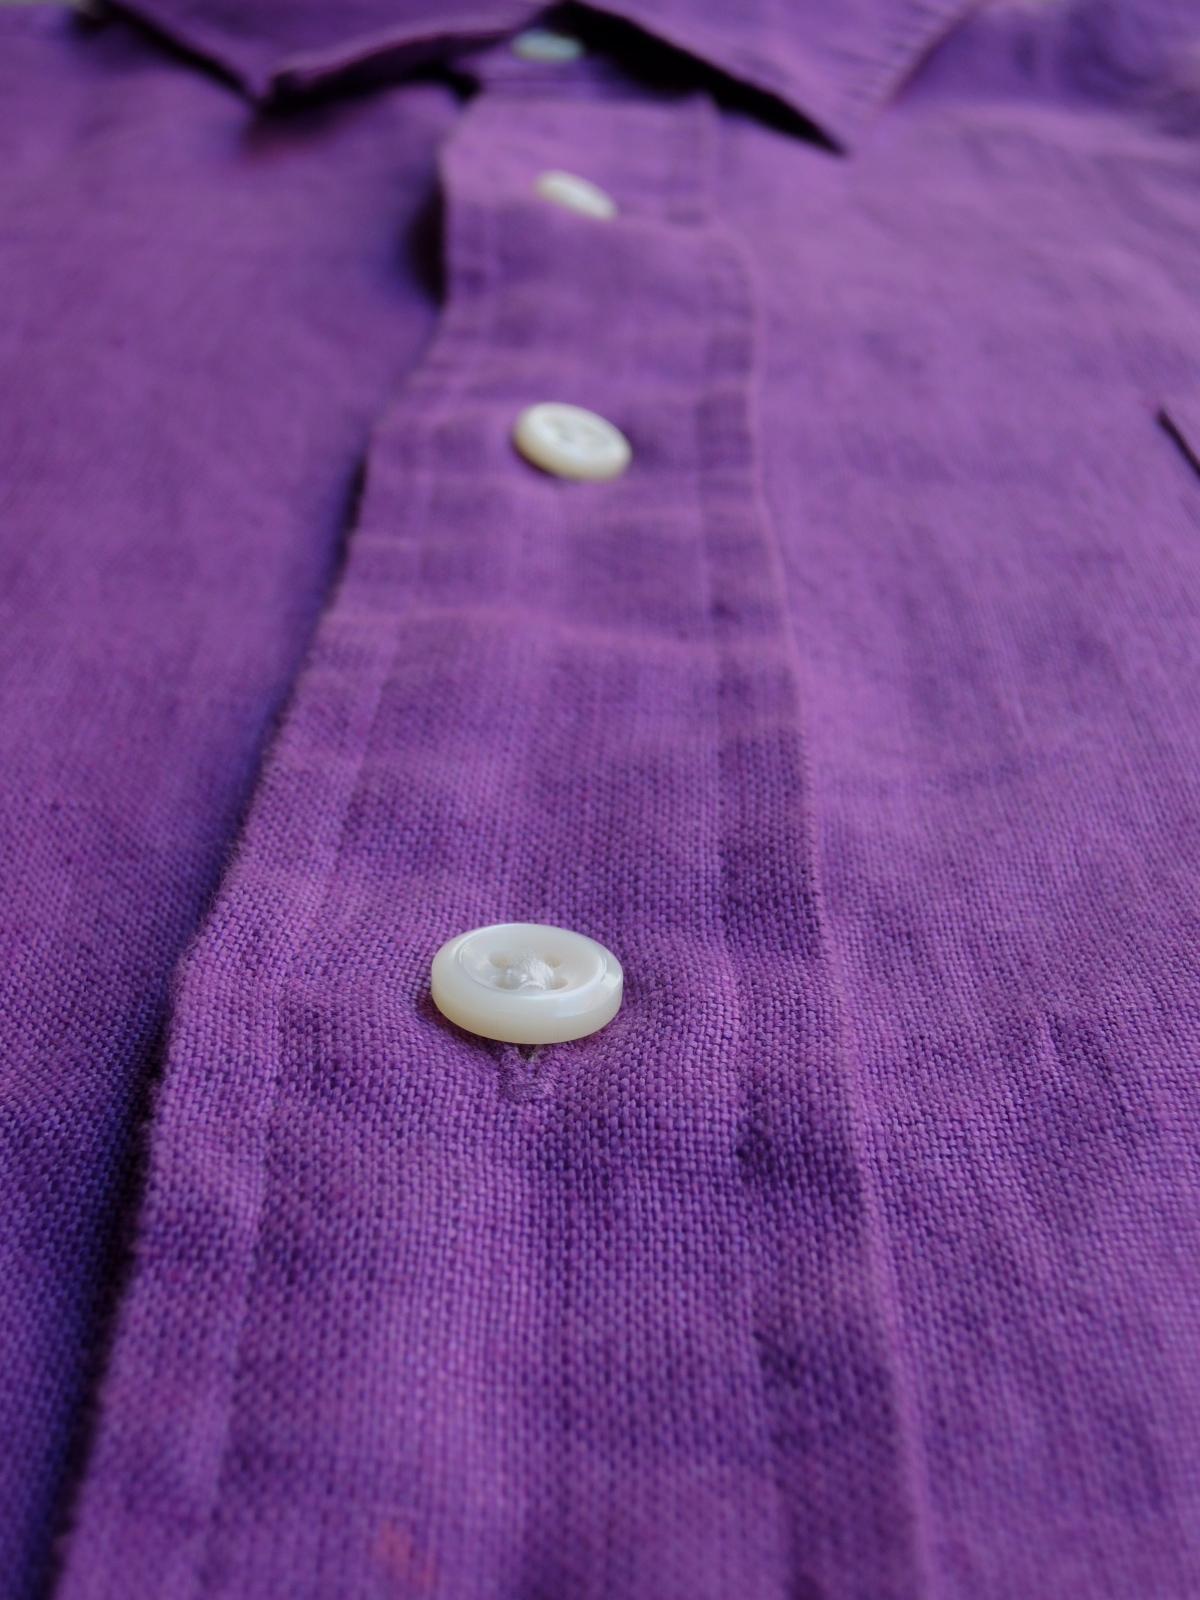 linenshirts03.JPG